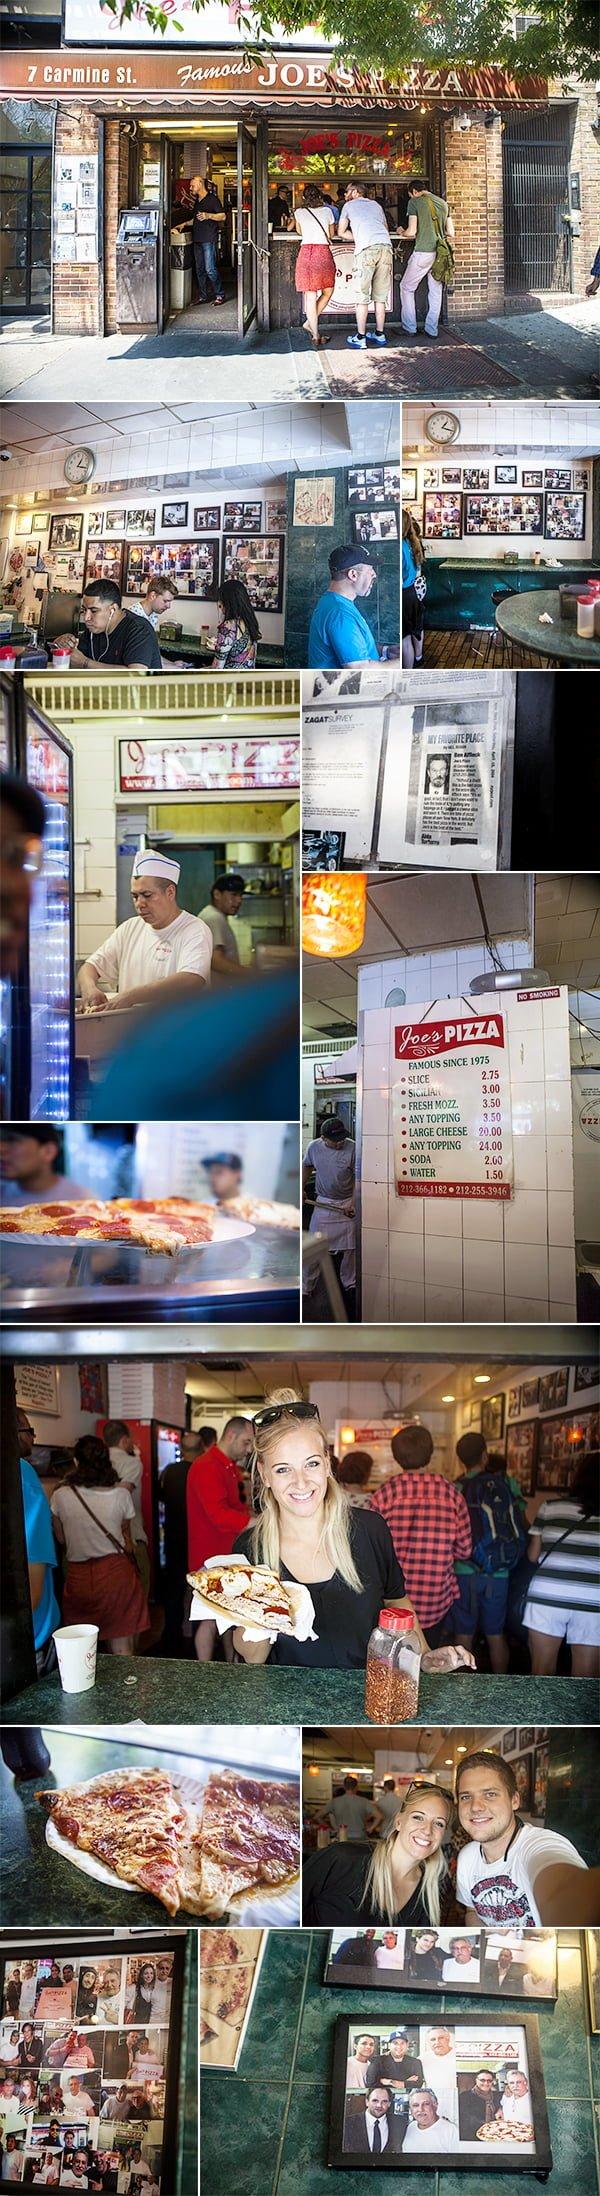 03-Joes-Pizza